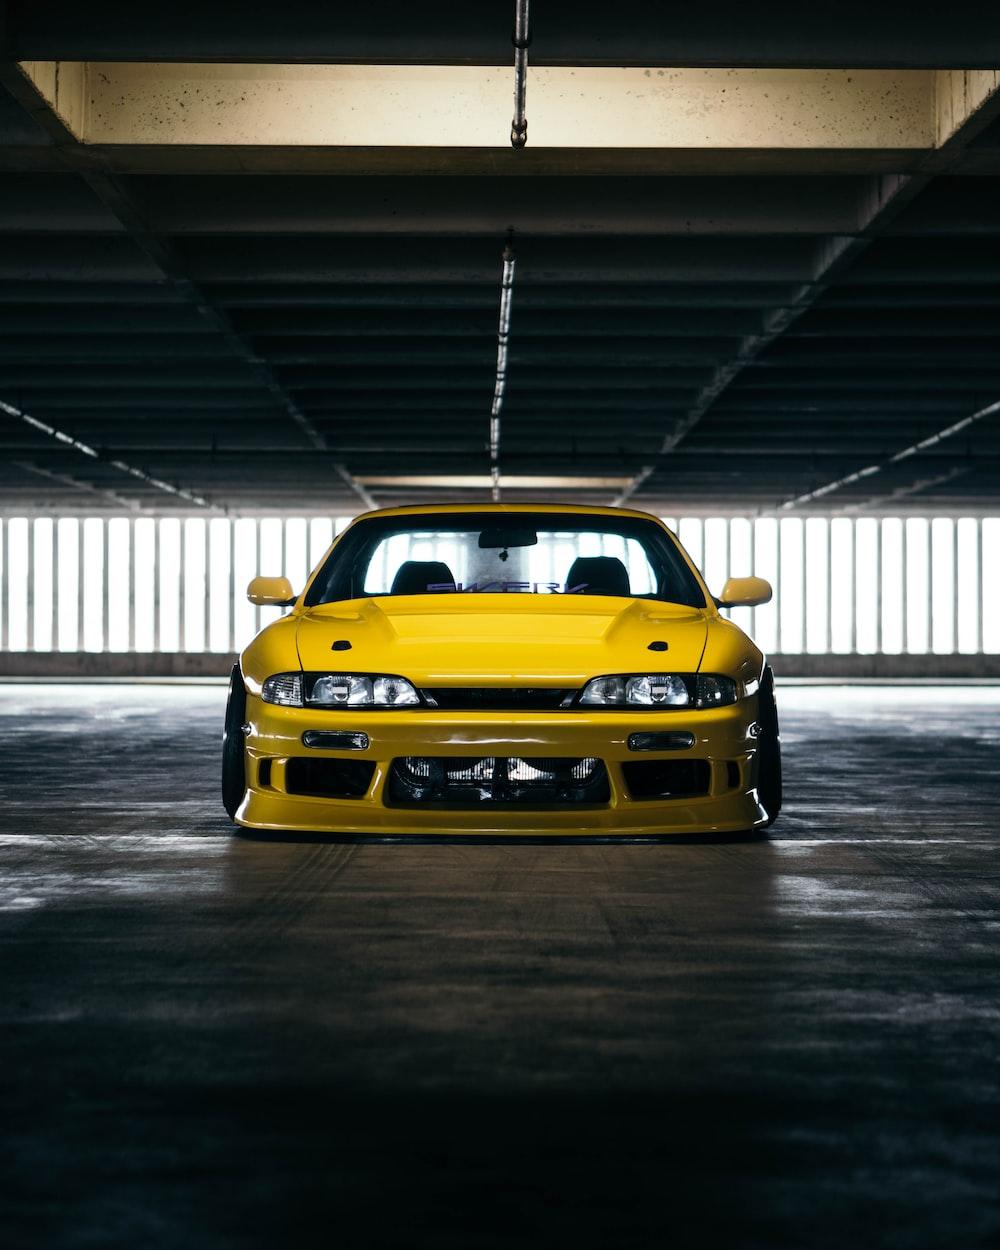 yellow sports car parking inside garage